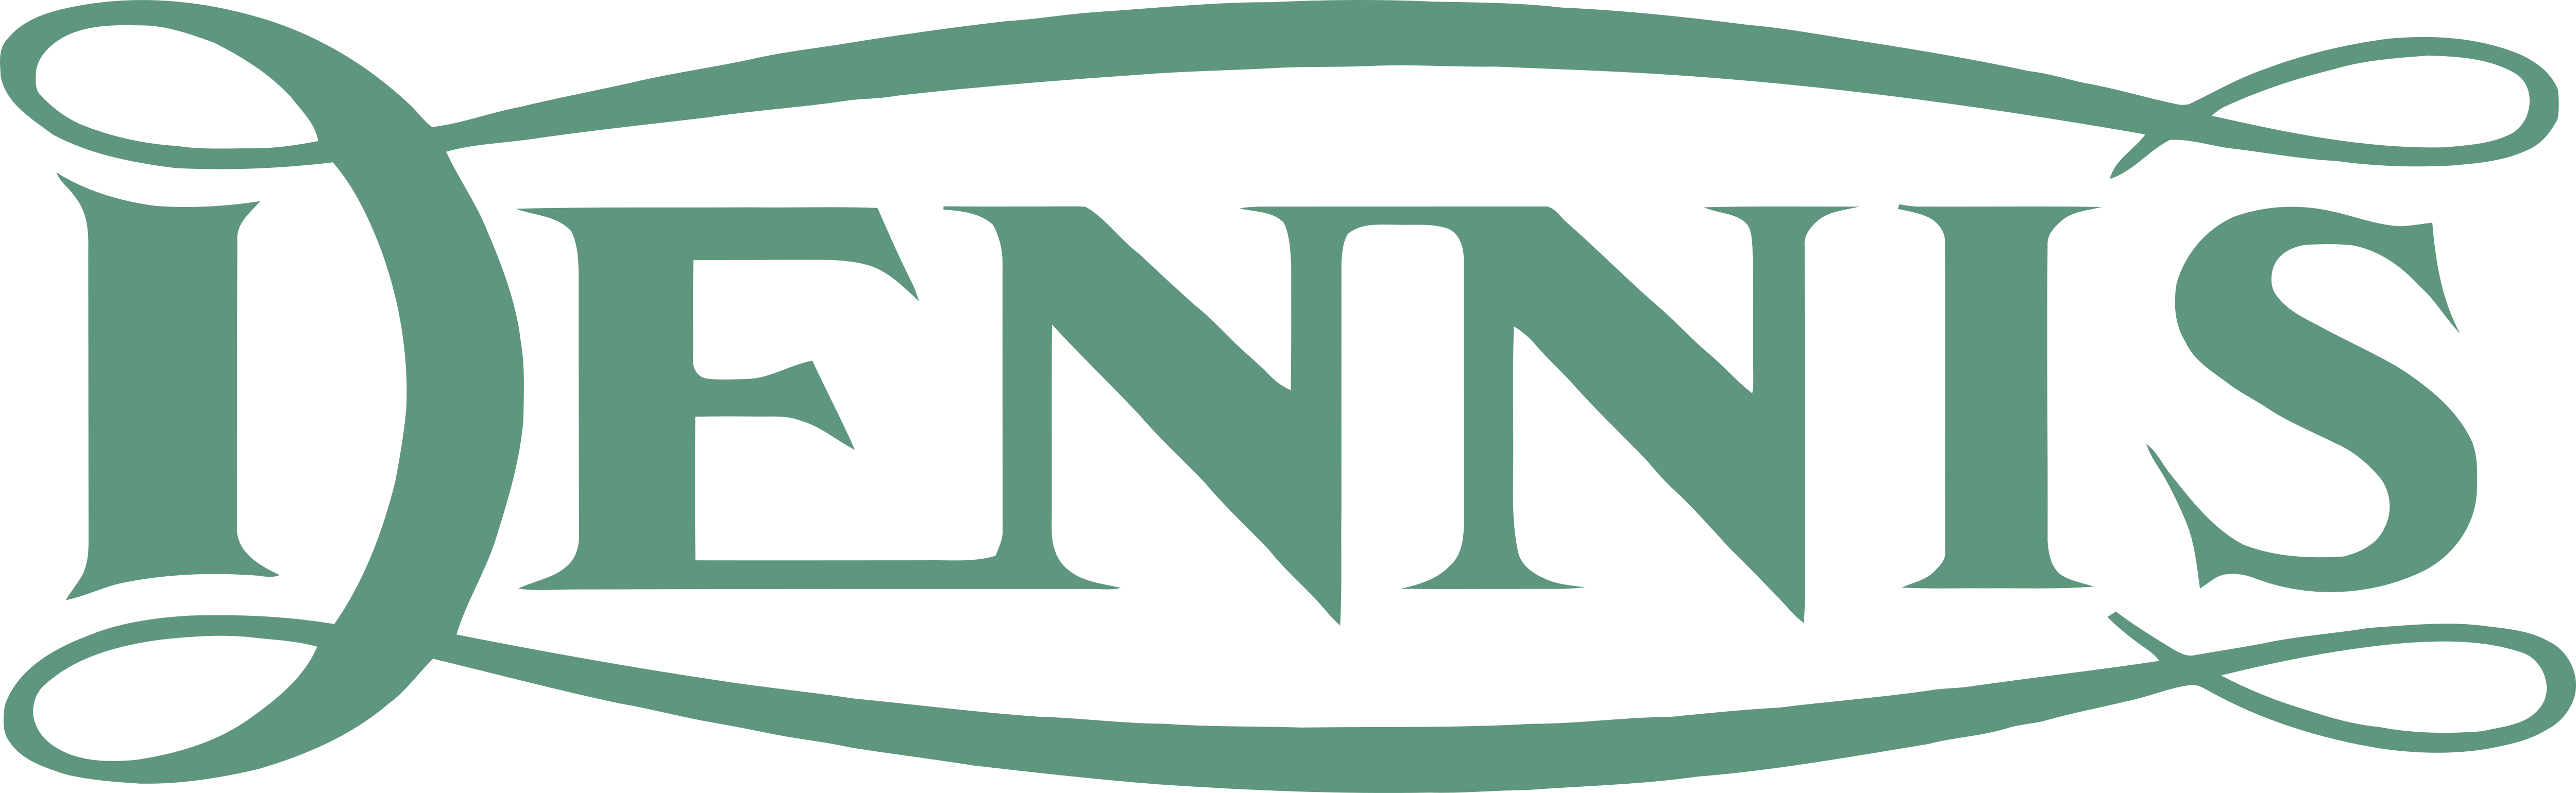 Dennis Specialist Vehicles Logos Download